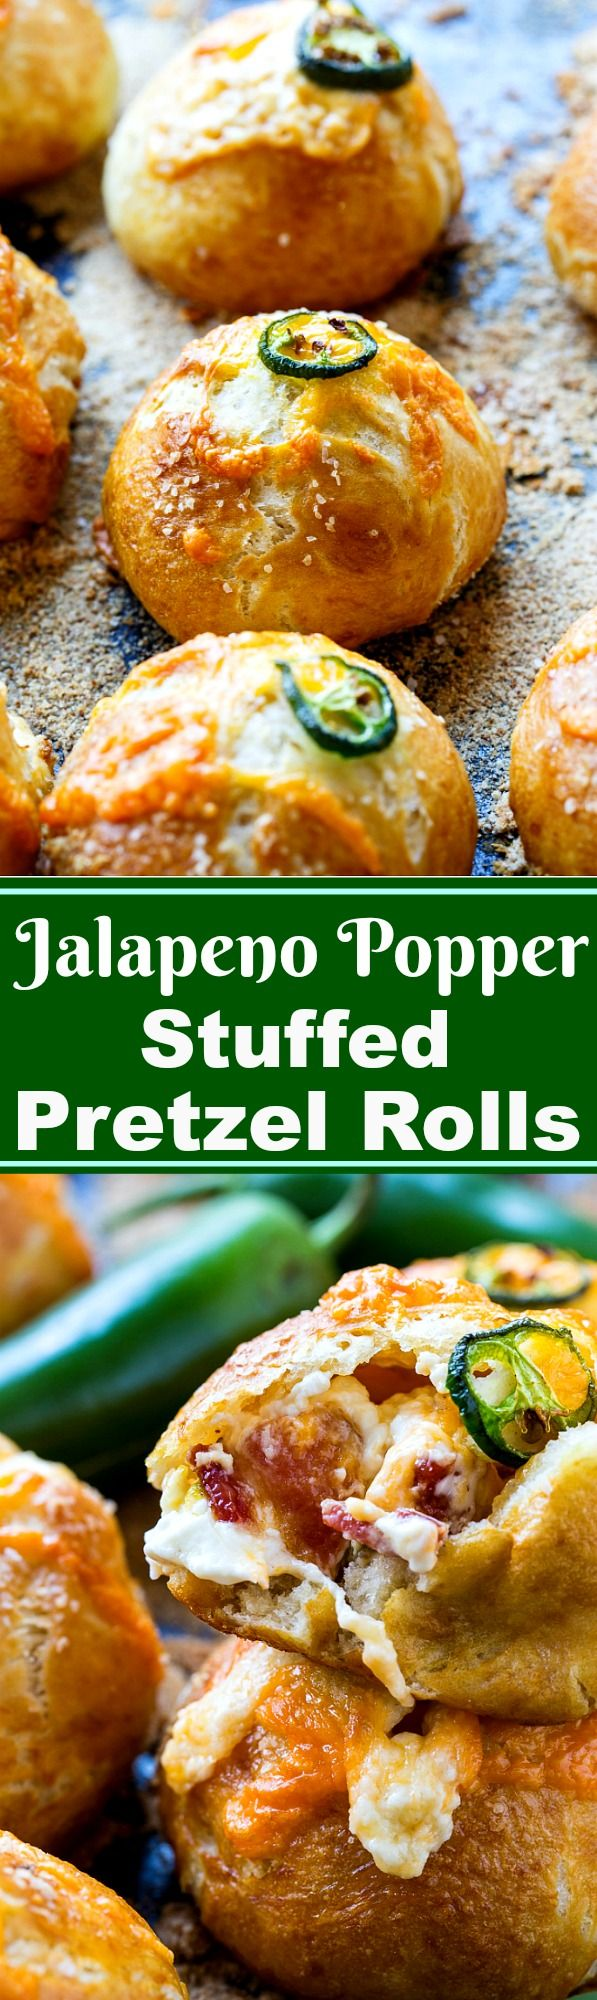 Jalapeno Popper Pretzel Rolls make a great game day food.